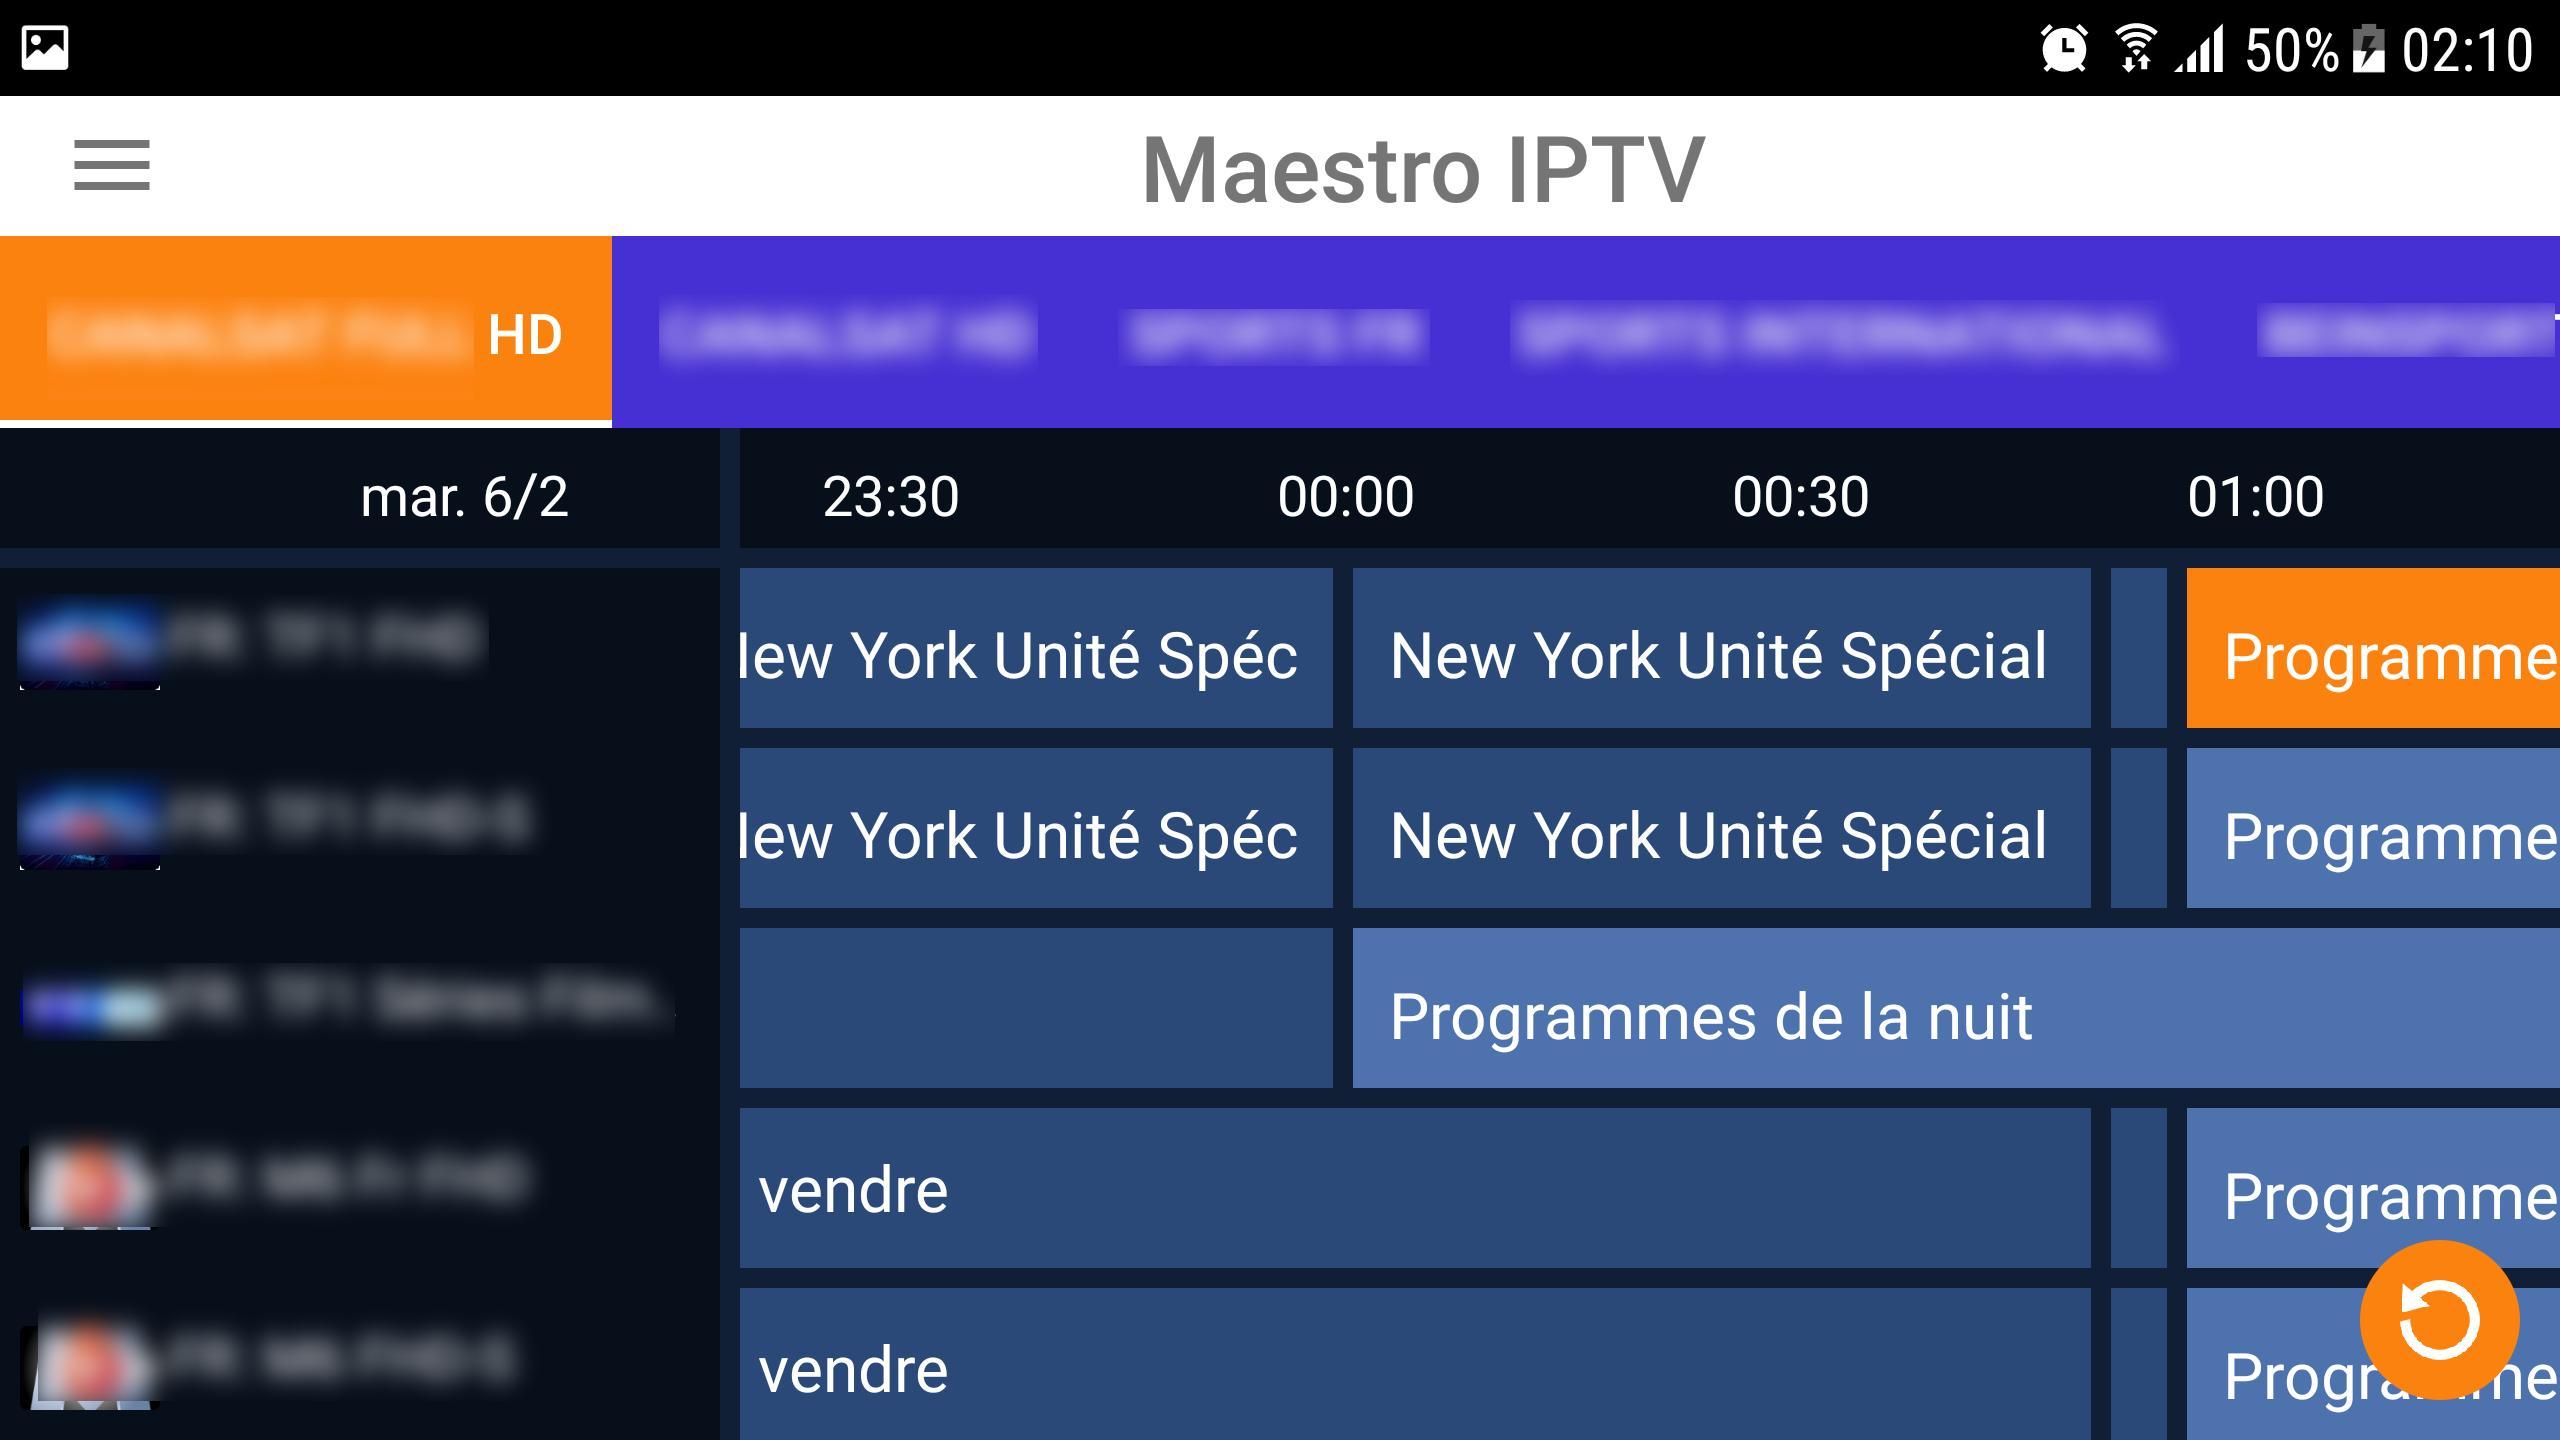 MAESTRO IPTV TÉLÉCHARGER